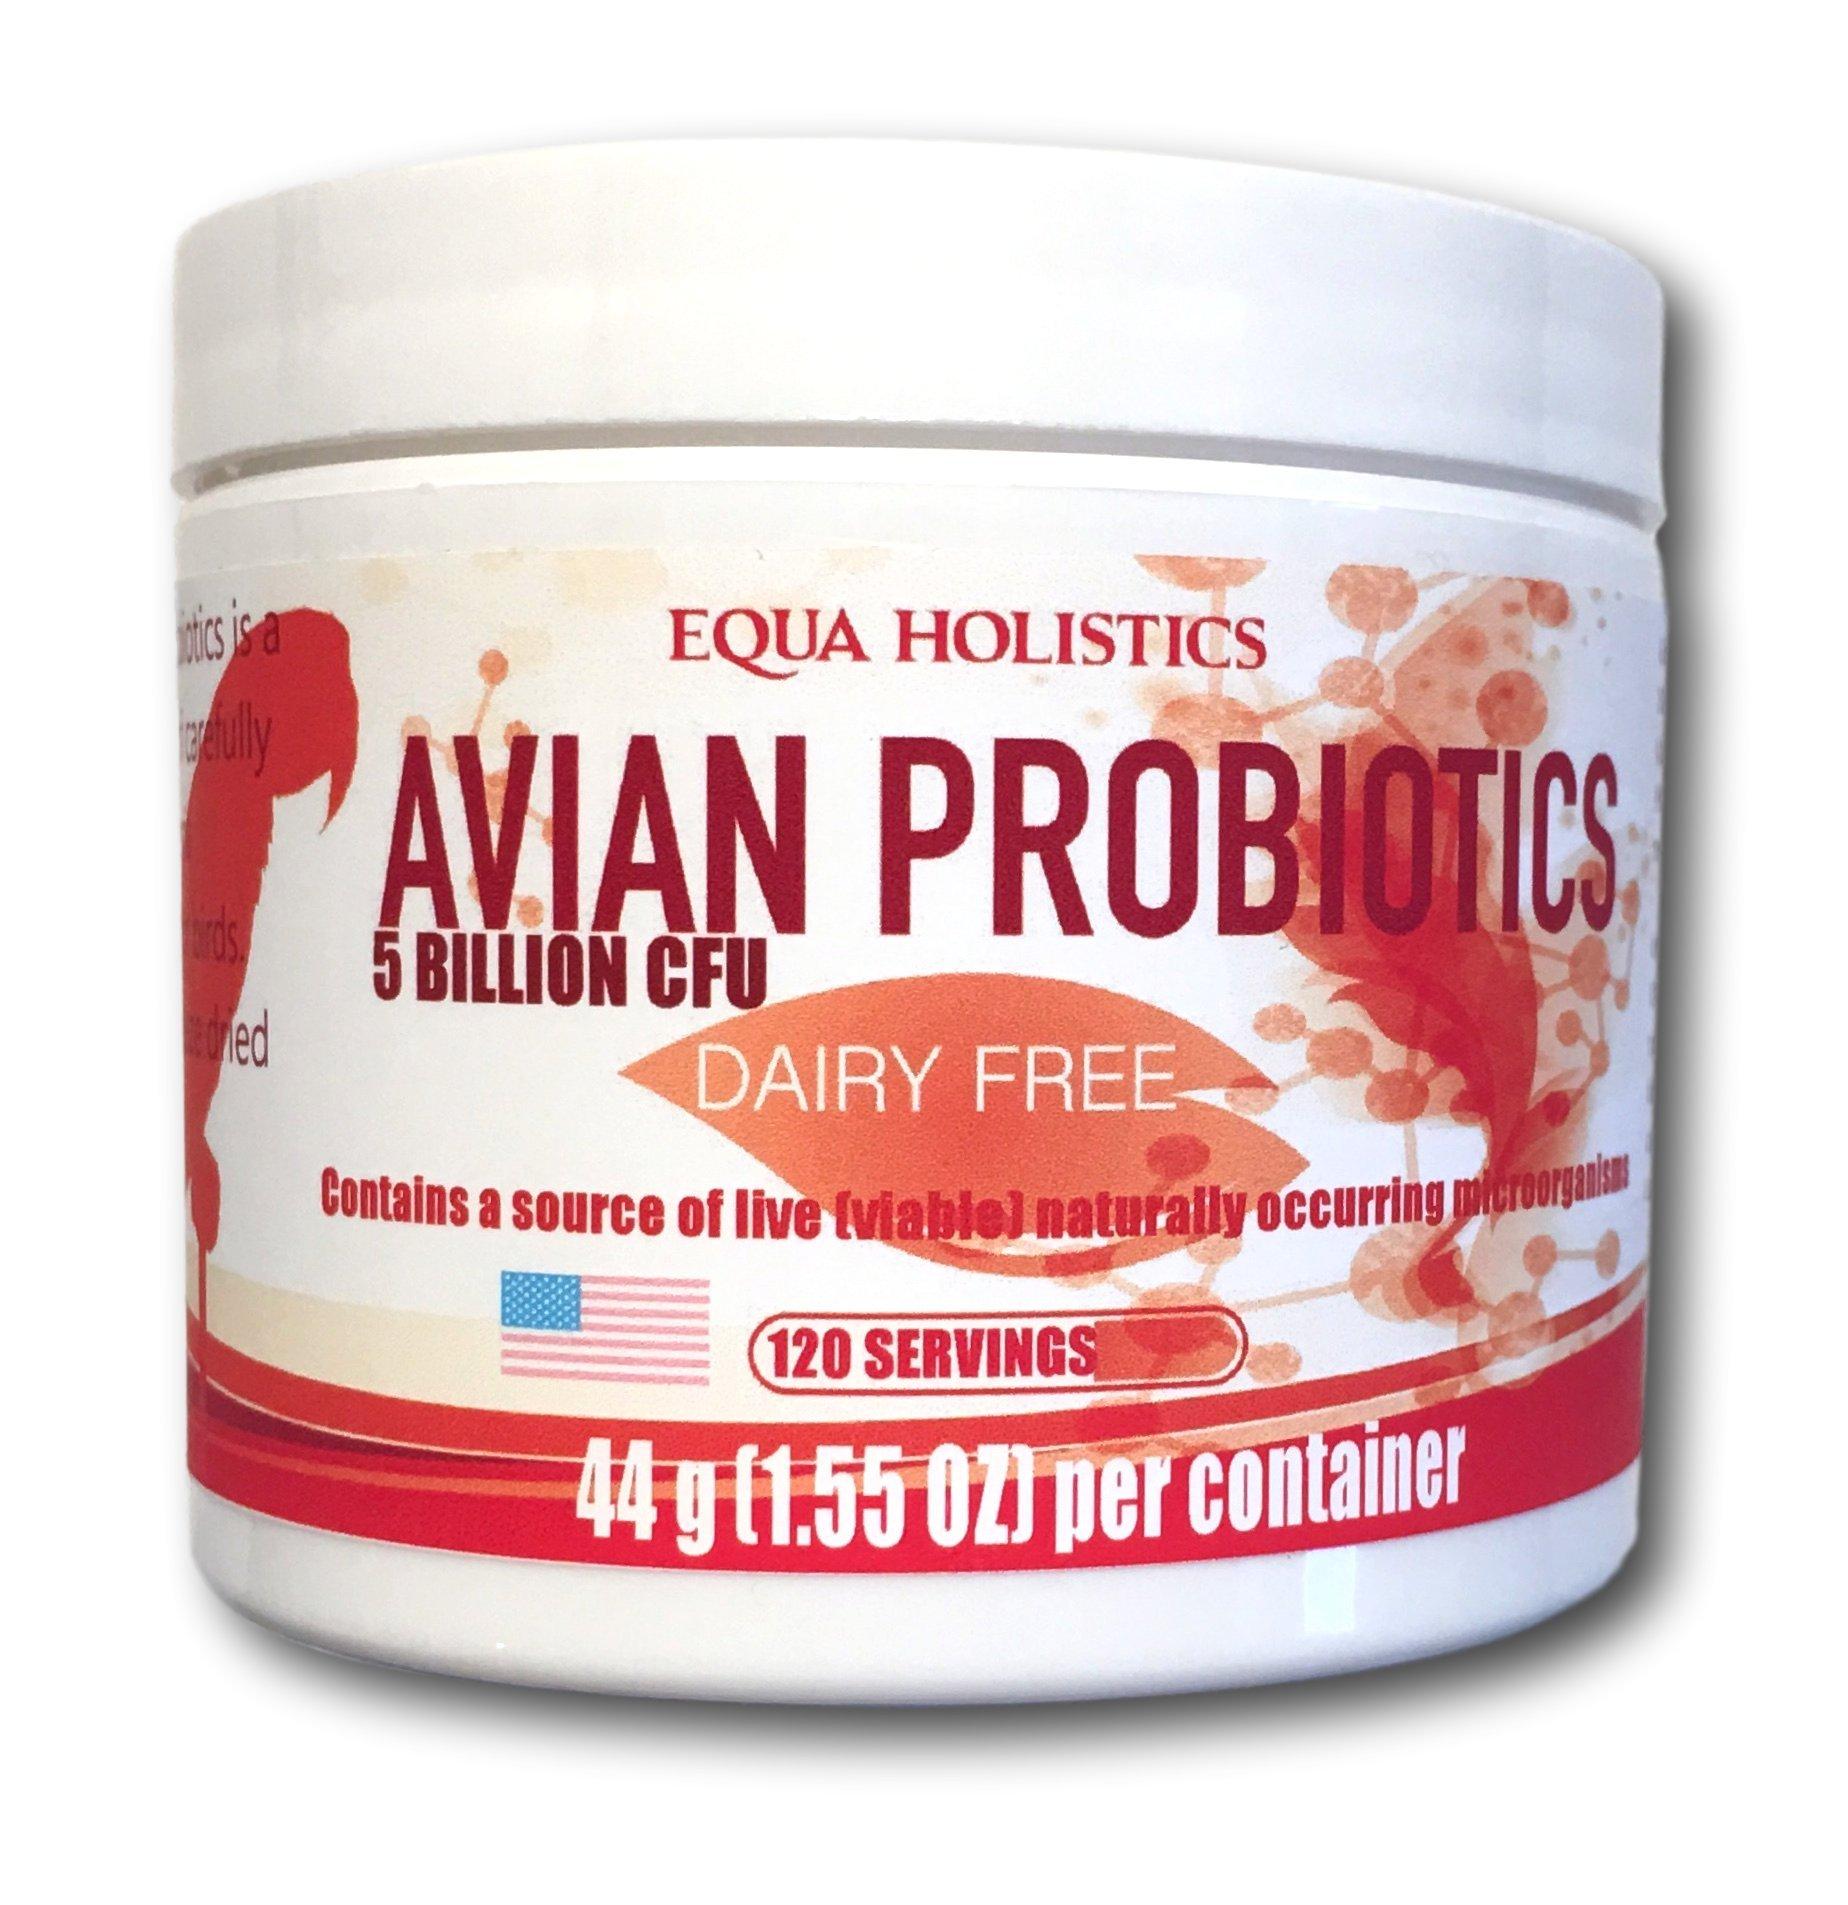 Avian Probiotics | 120 Servings | Dairy Free